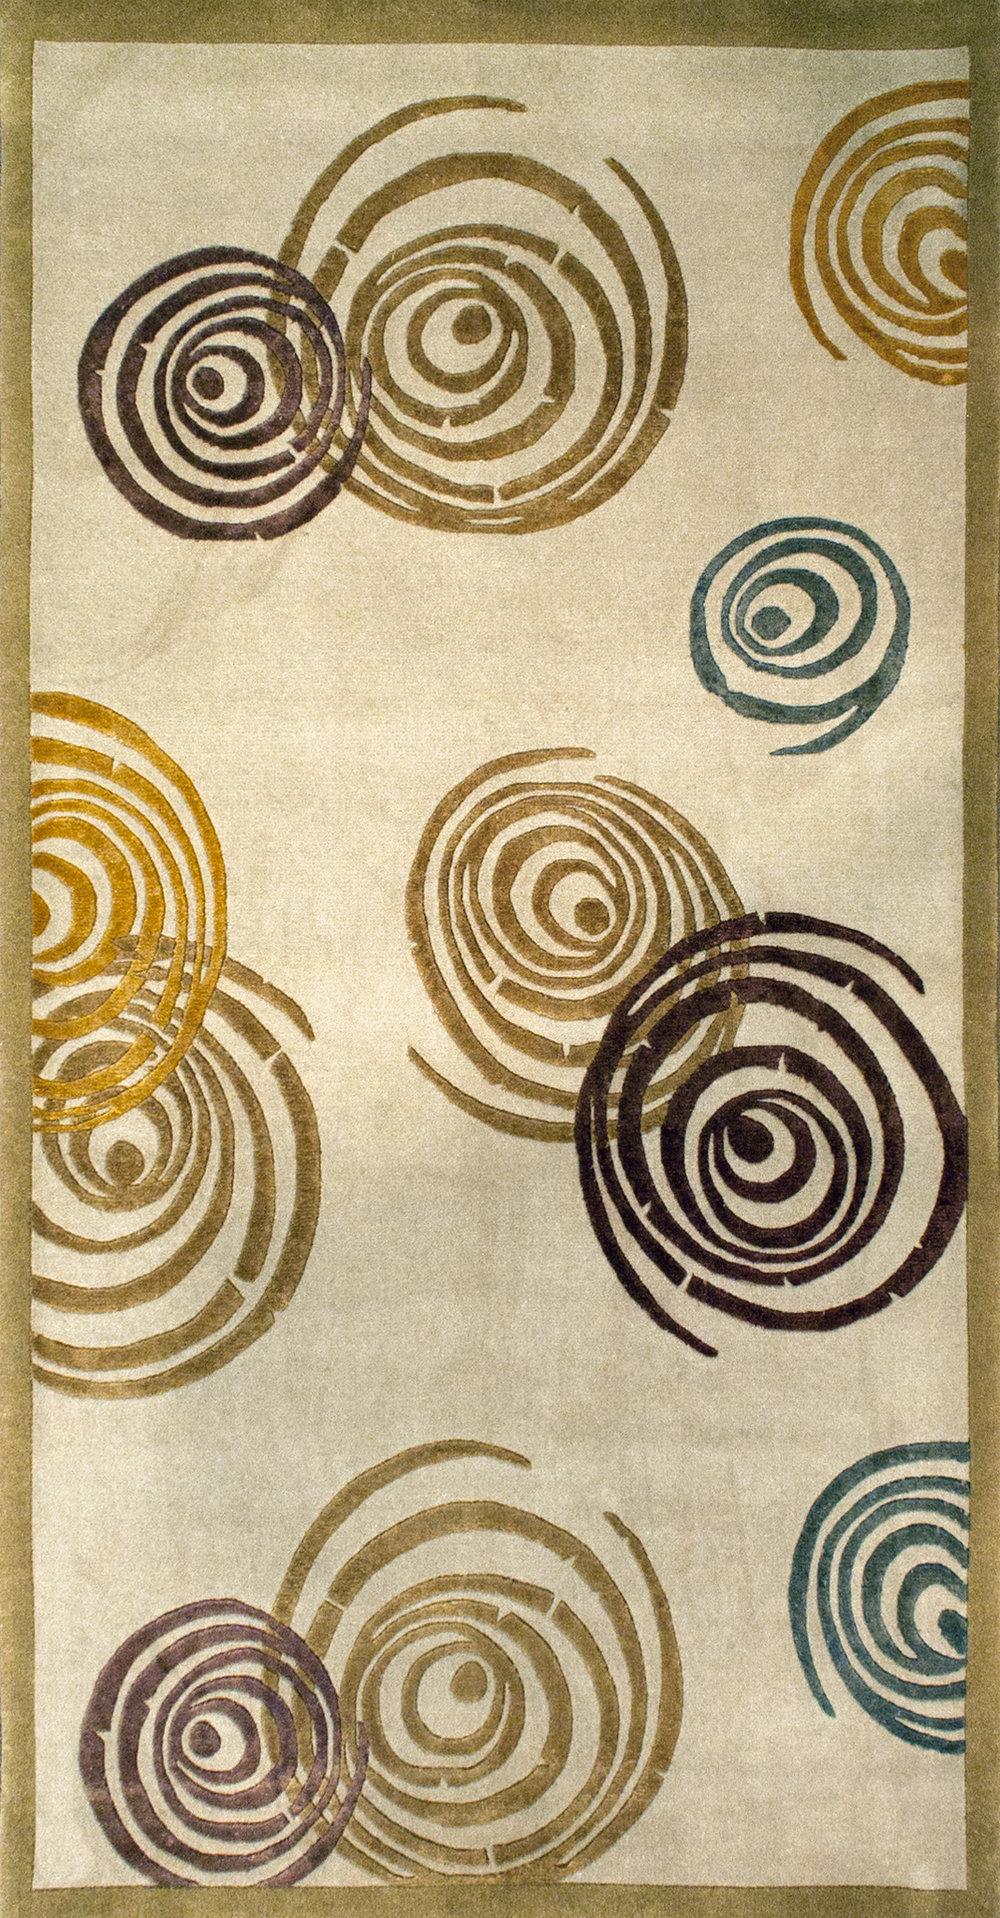 Colorful Spirals Rug.jpg